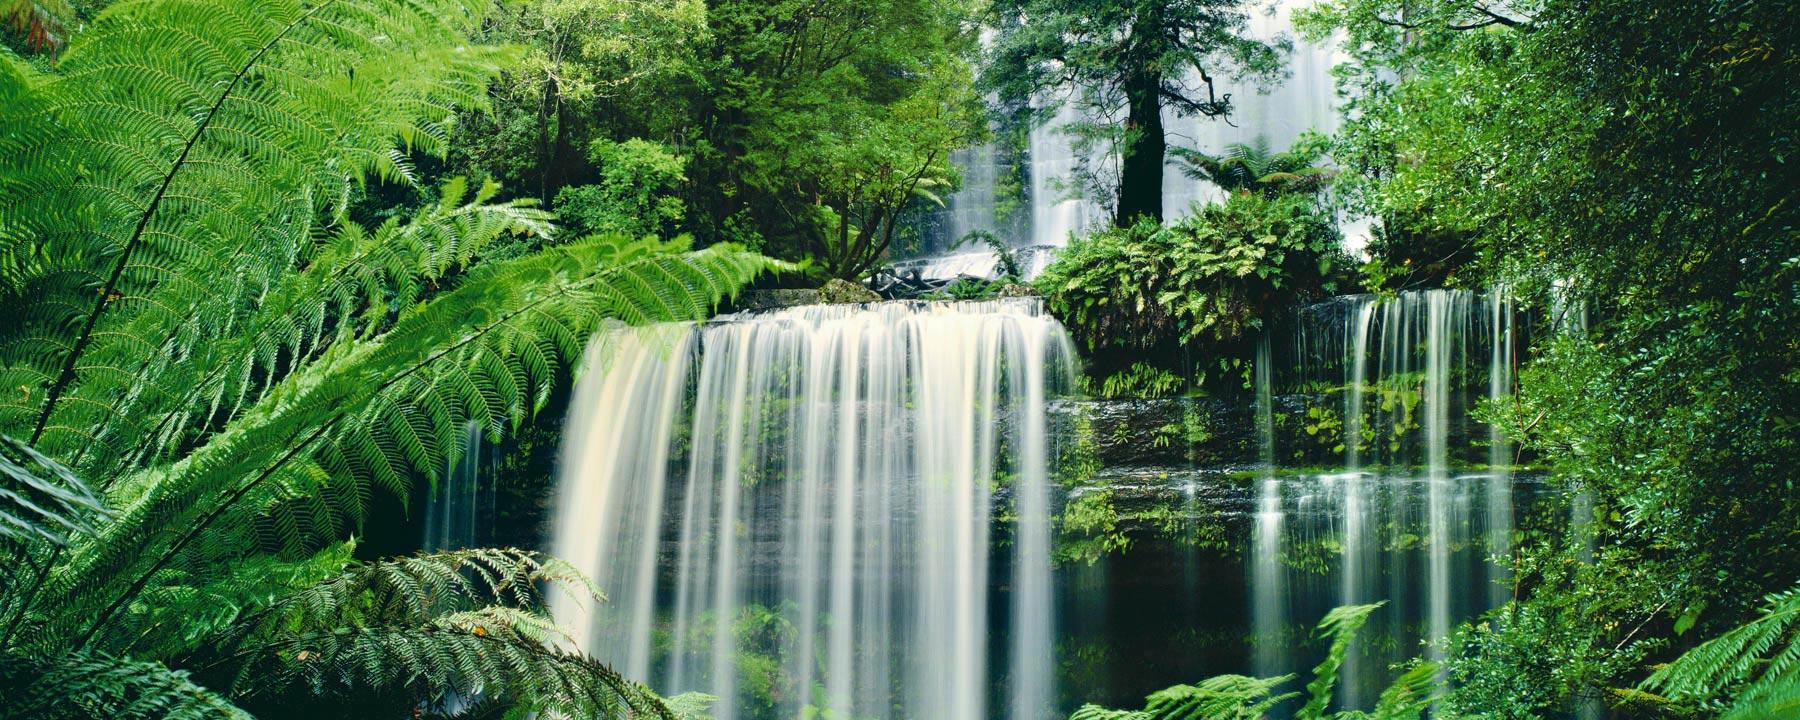 Gift of Life, Russell Falls, Australia